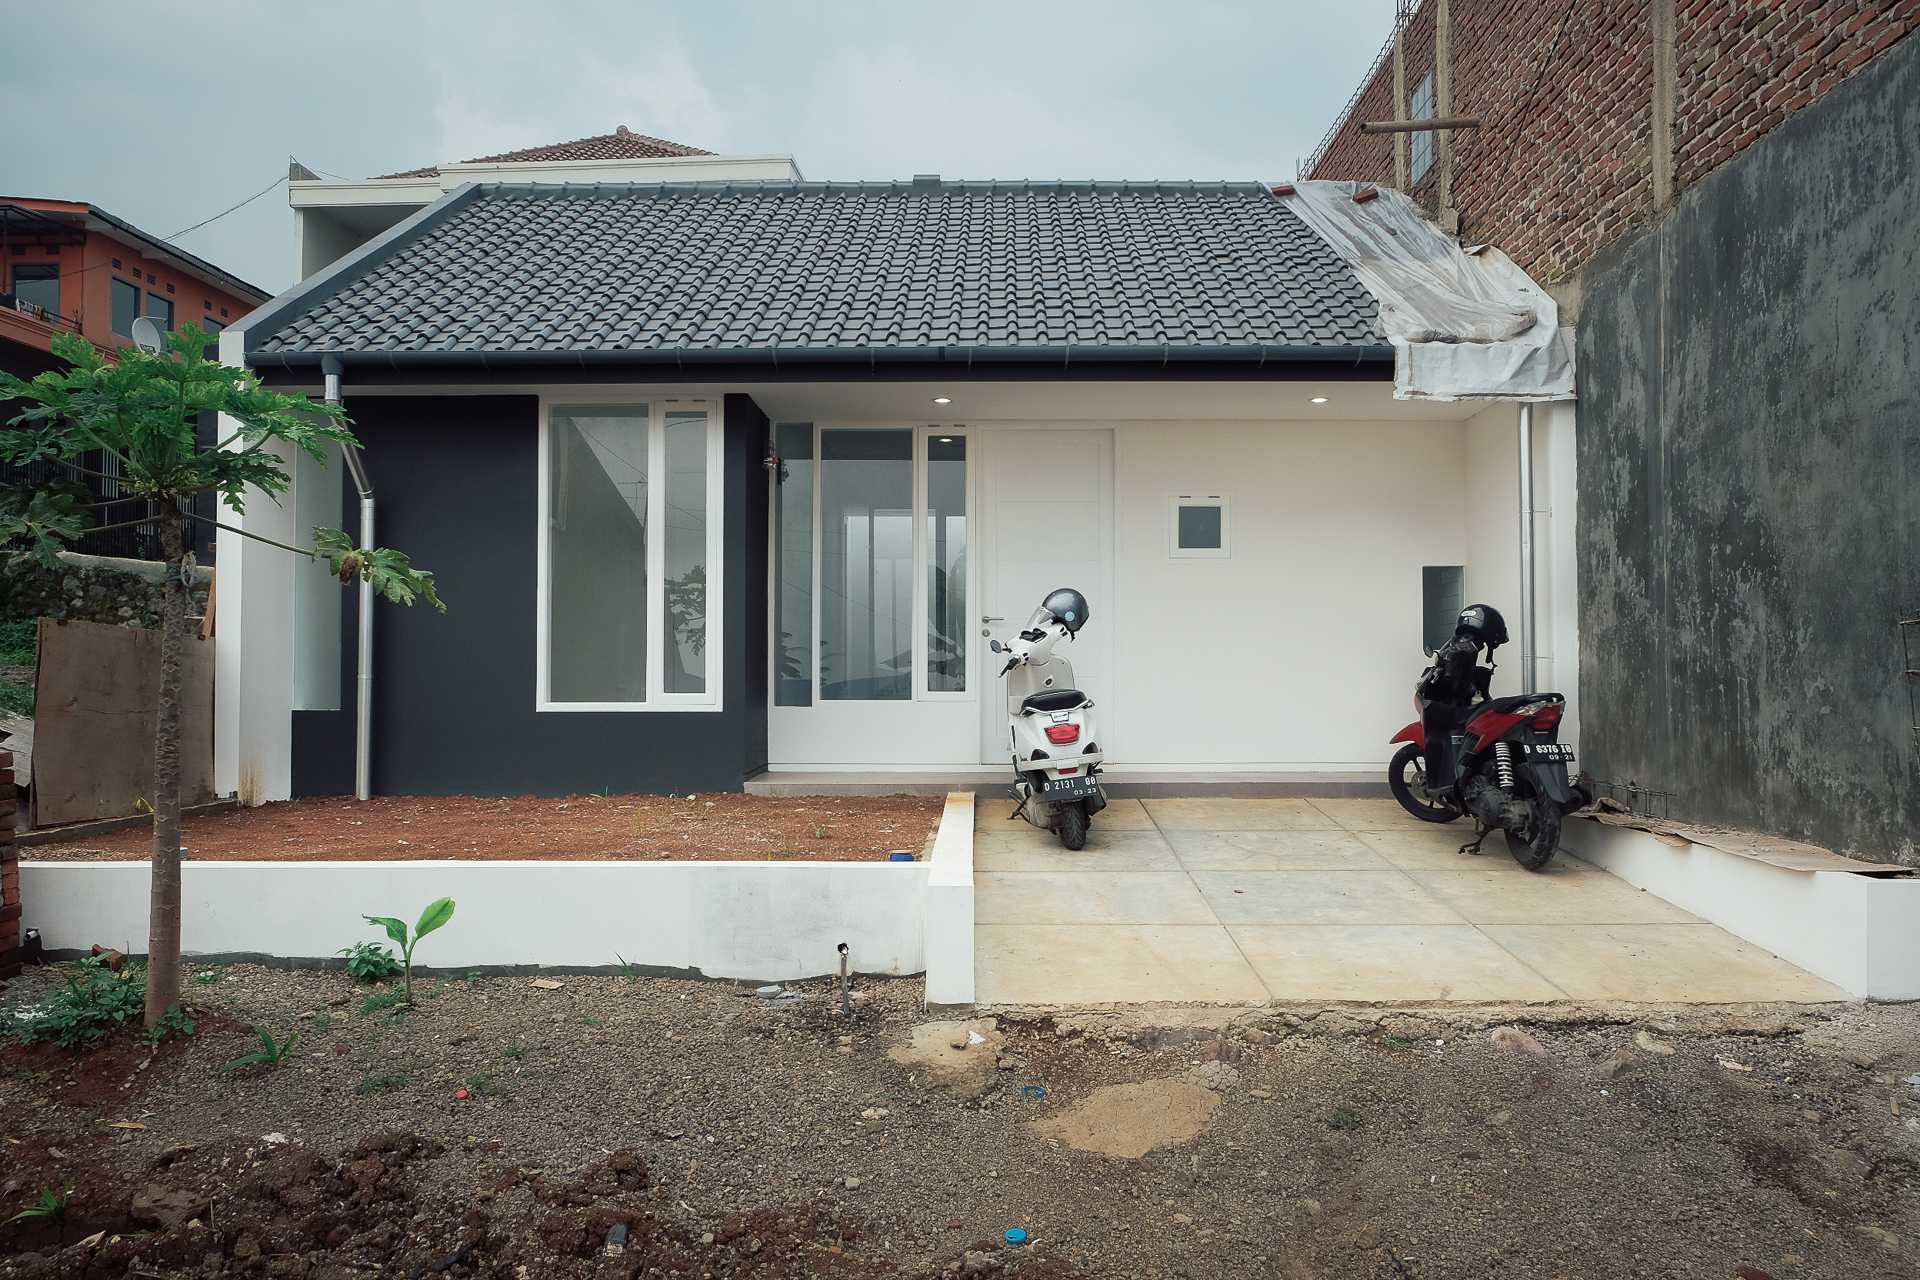 Mid Works Gmw House Jatihandap, Kec. Mandalajati, Kota Bandung, Jawa Barat, Indonesia Jatihandap, Kec. Mandalajati, Kota Bandung, Jawa Barat, Indonesia Mid-Works-Gmw-House  94658